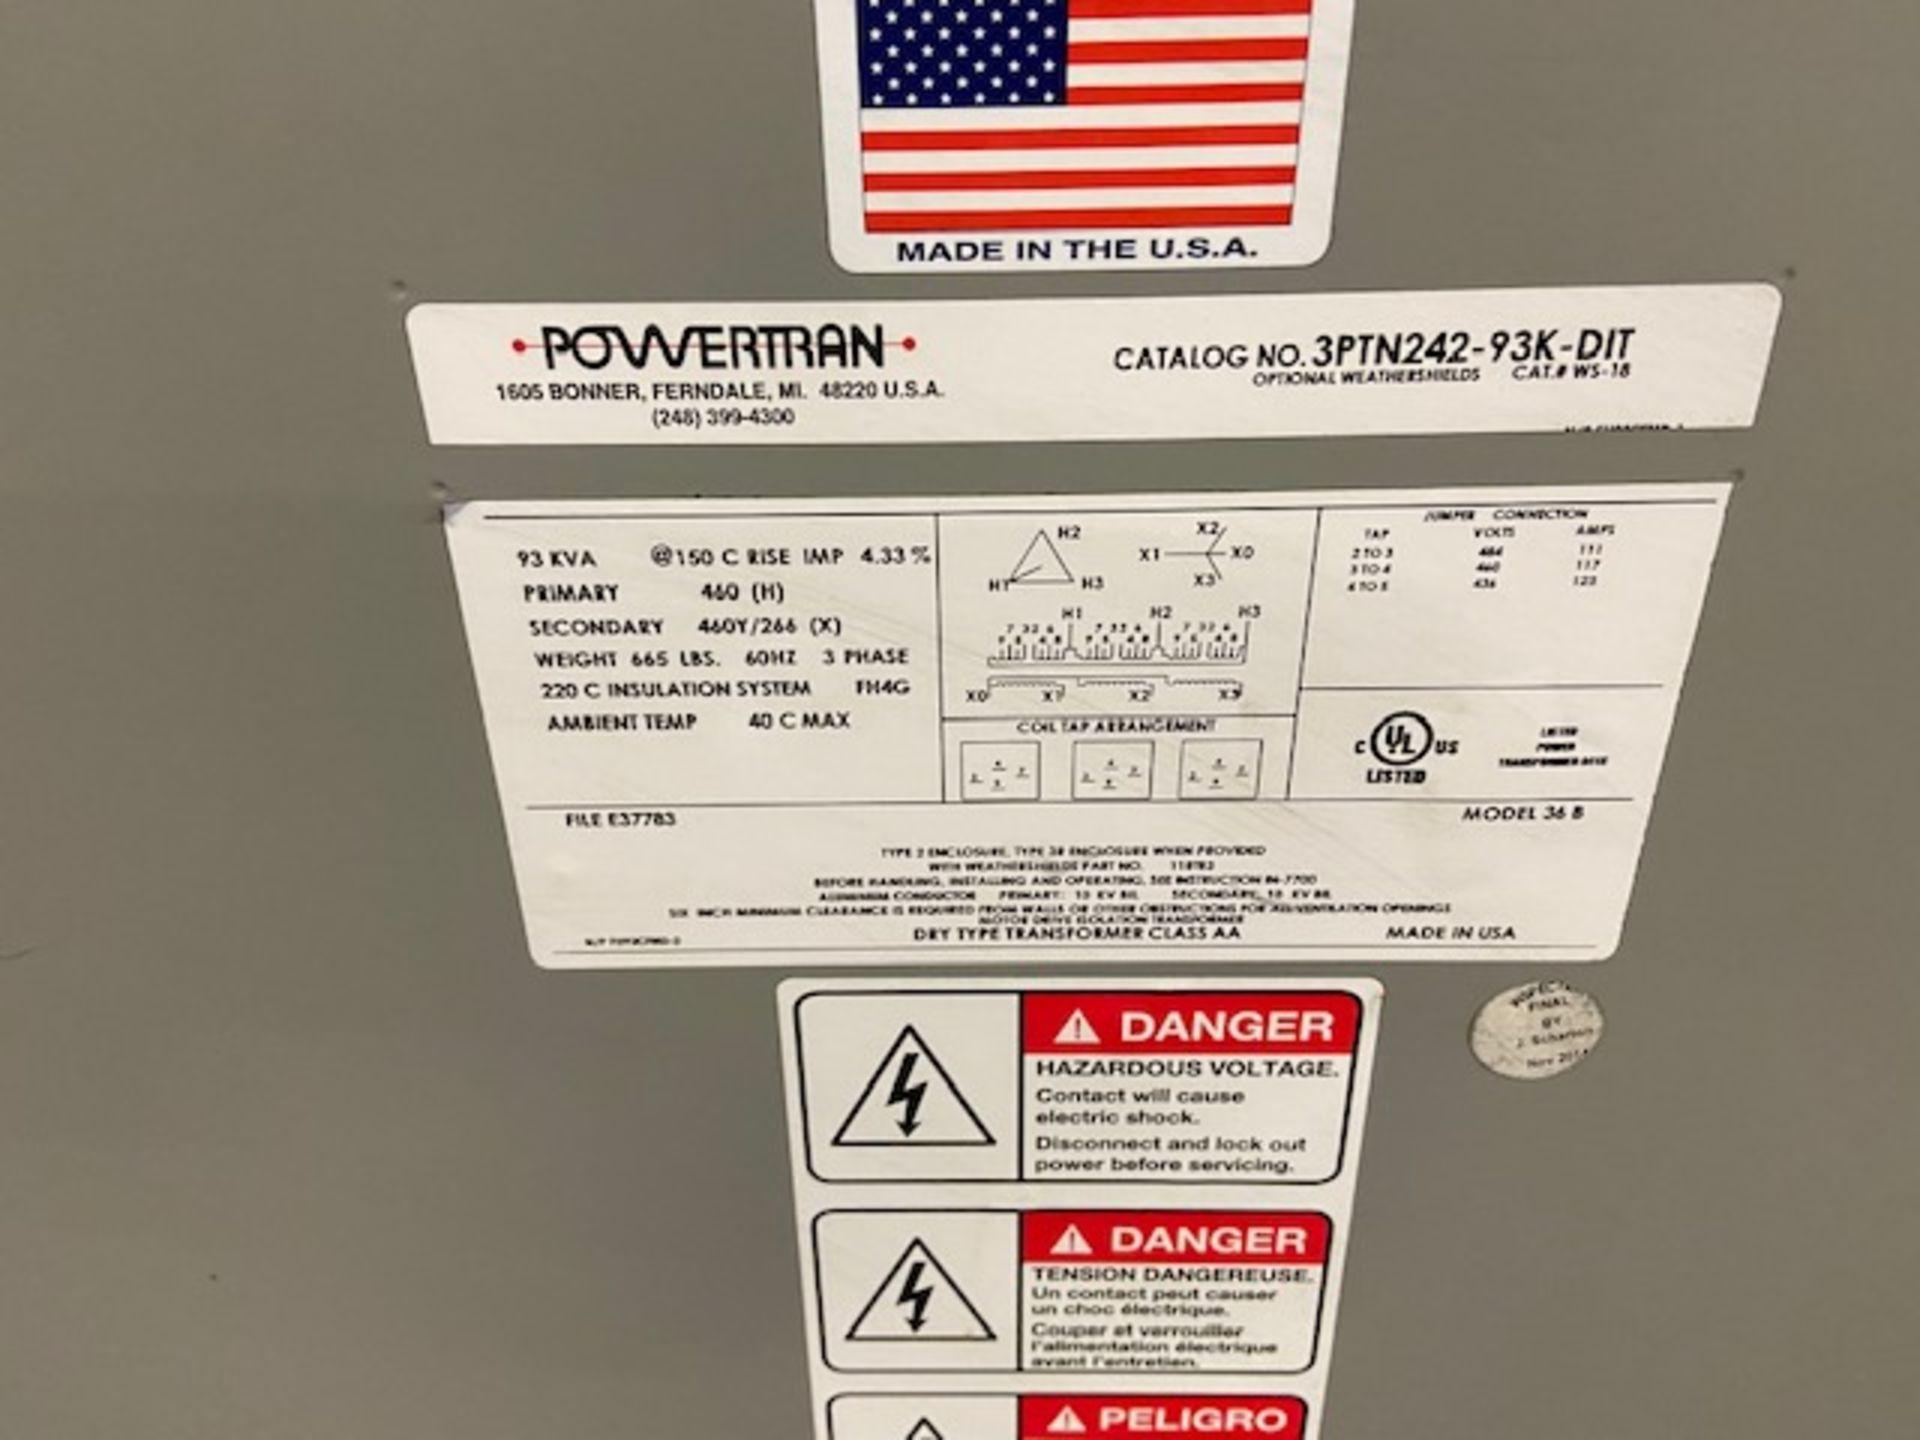 Powertran Electrical Transformer 93KVA 460/460Y/266V - Image 2 of 2